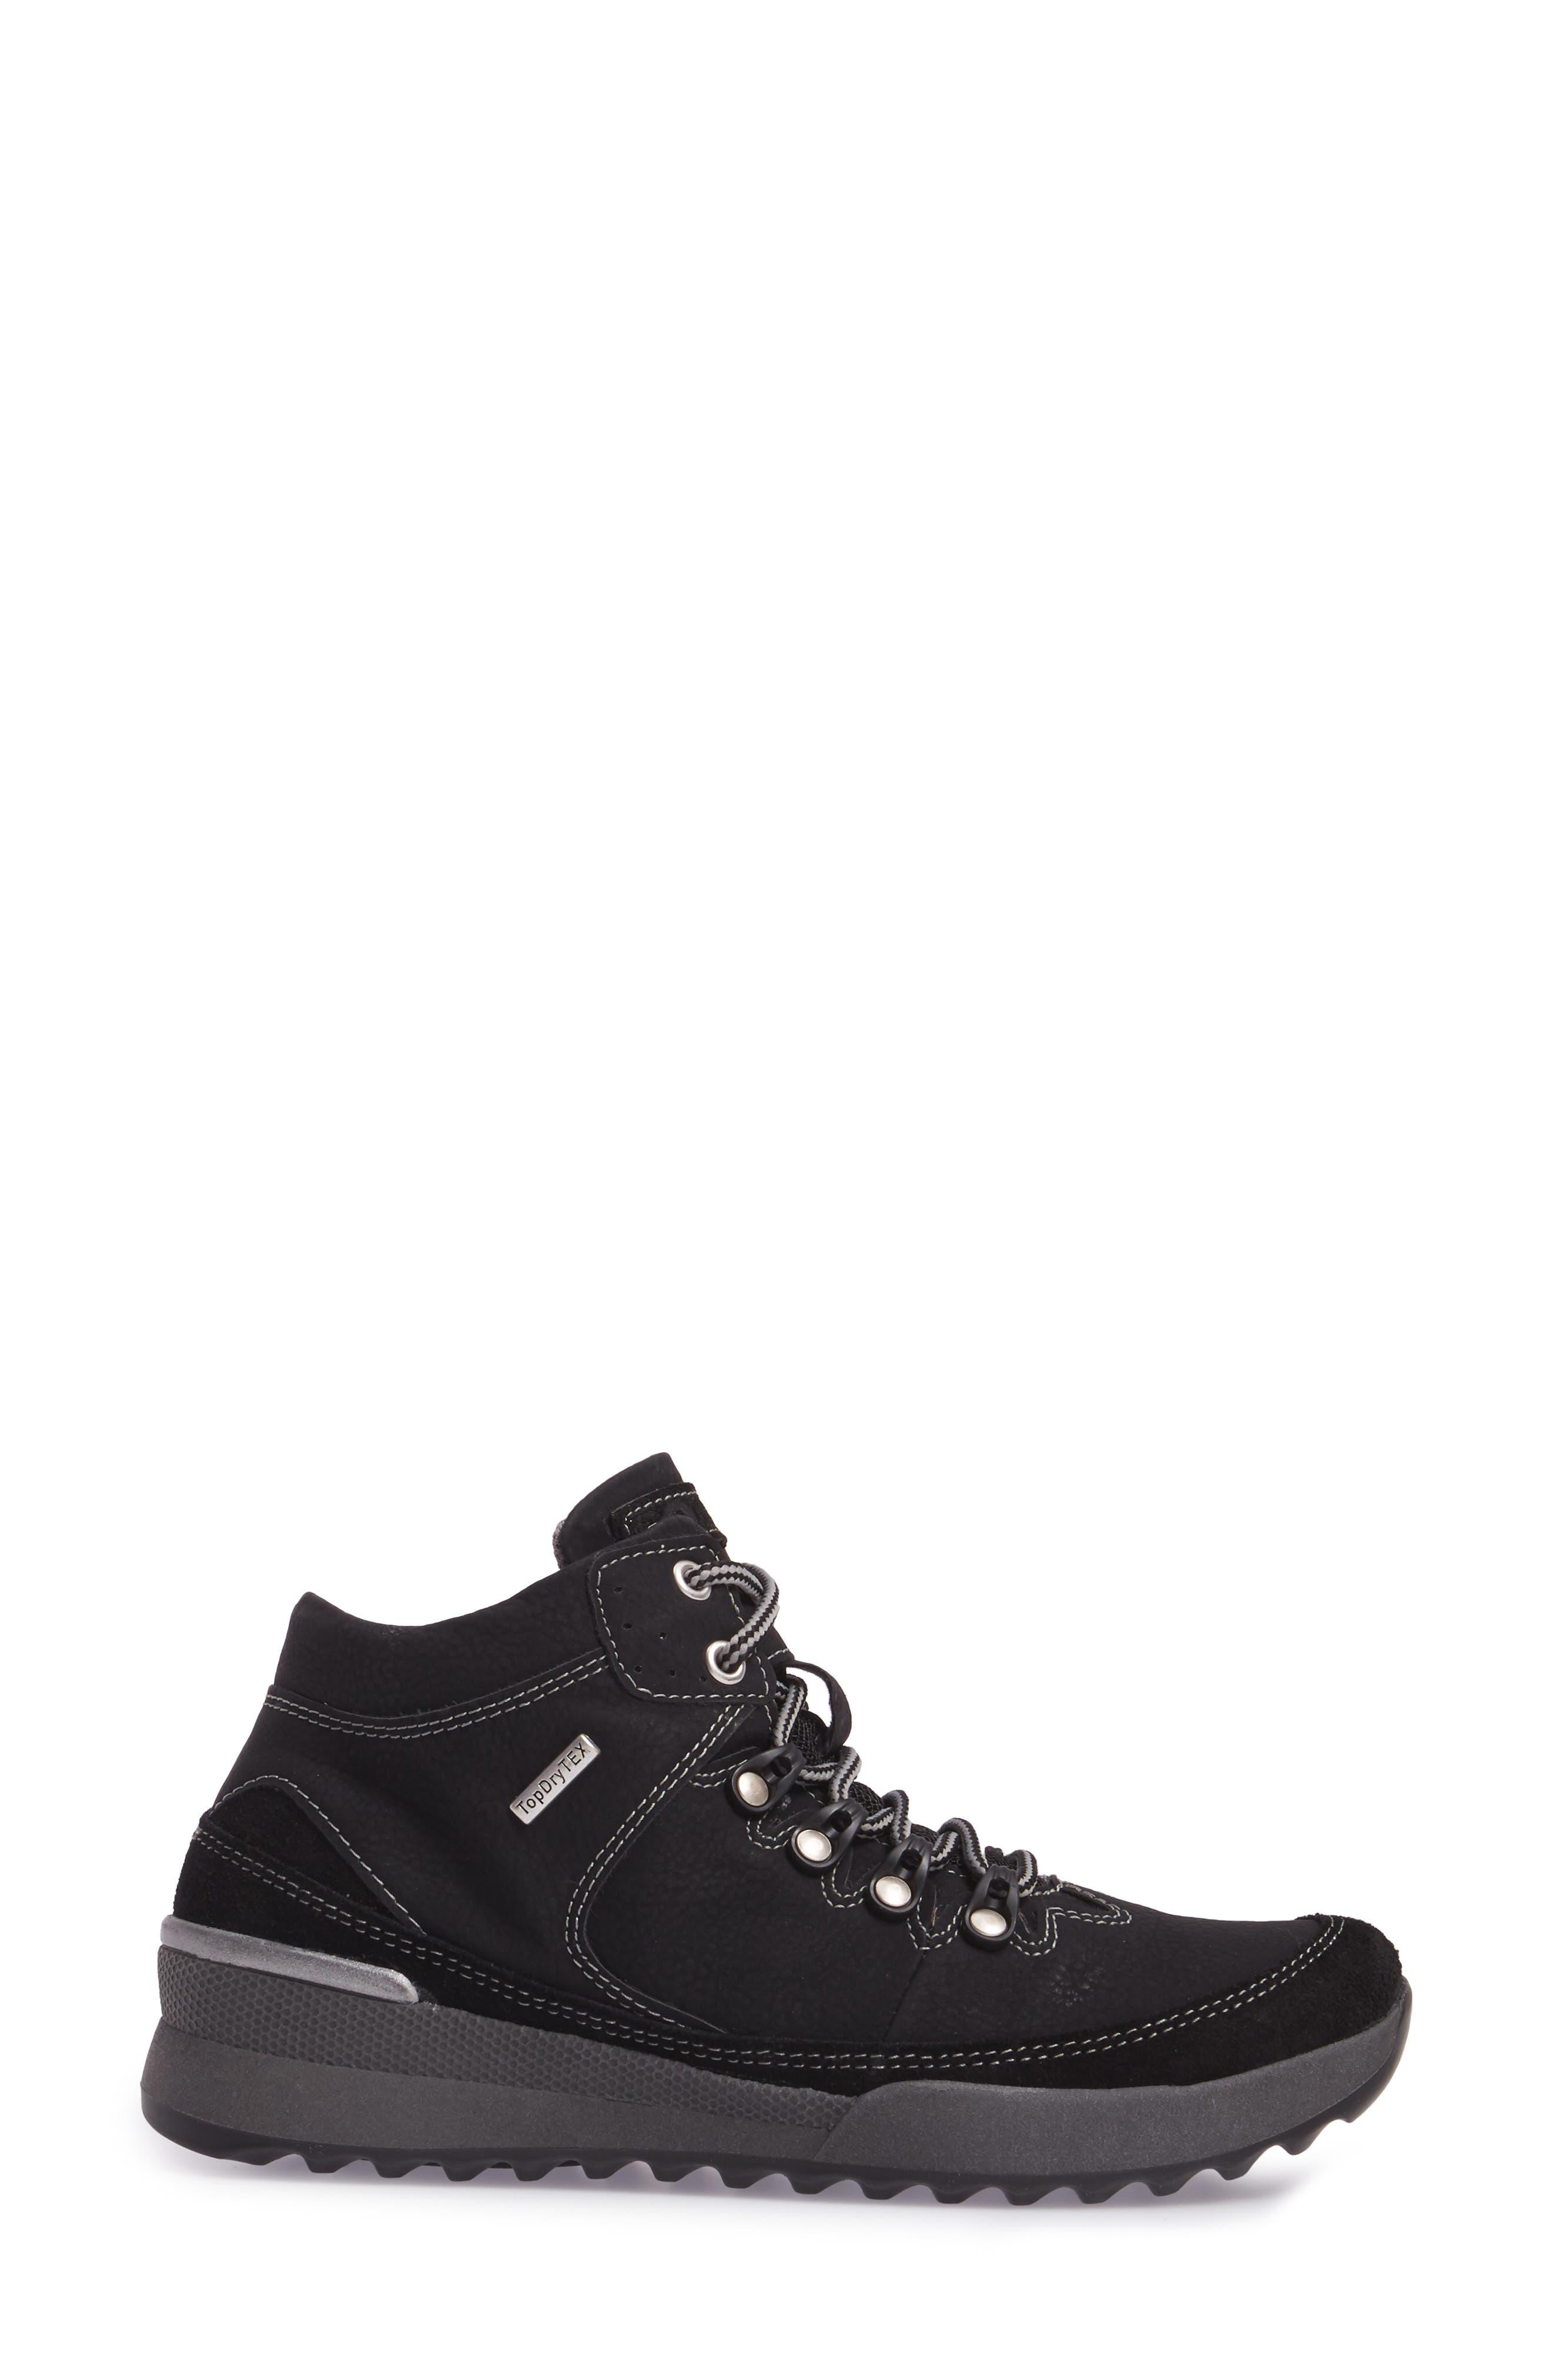 Victoria 05 Waterproof Sneaker,                             Alternate thumbnail 3, color,                             BLACK/ KOMBI LEATHER